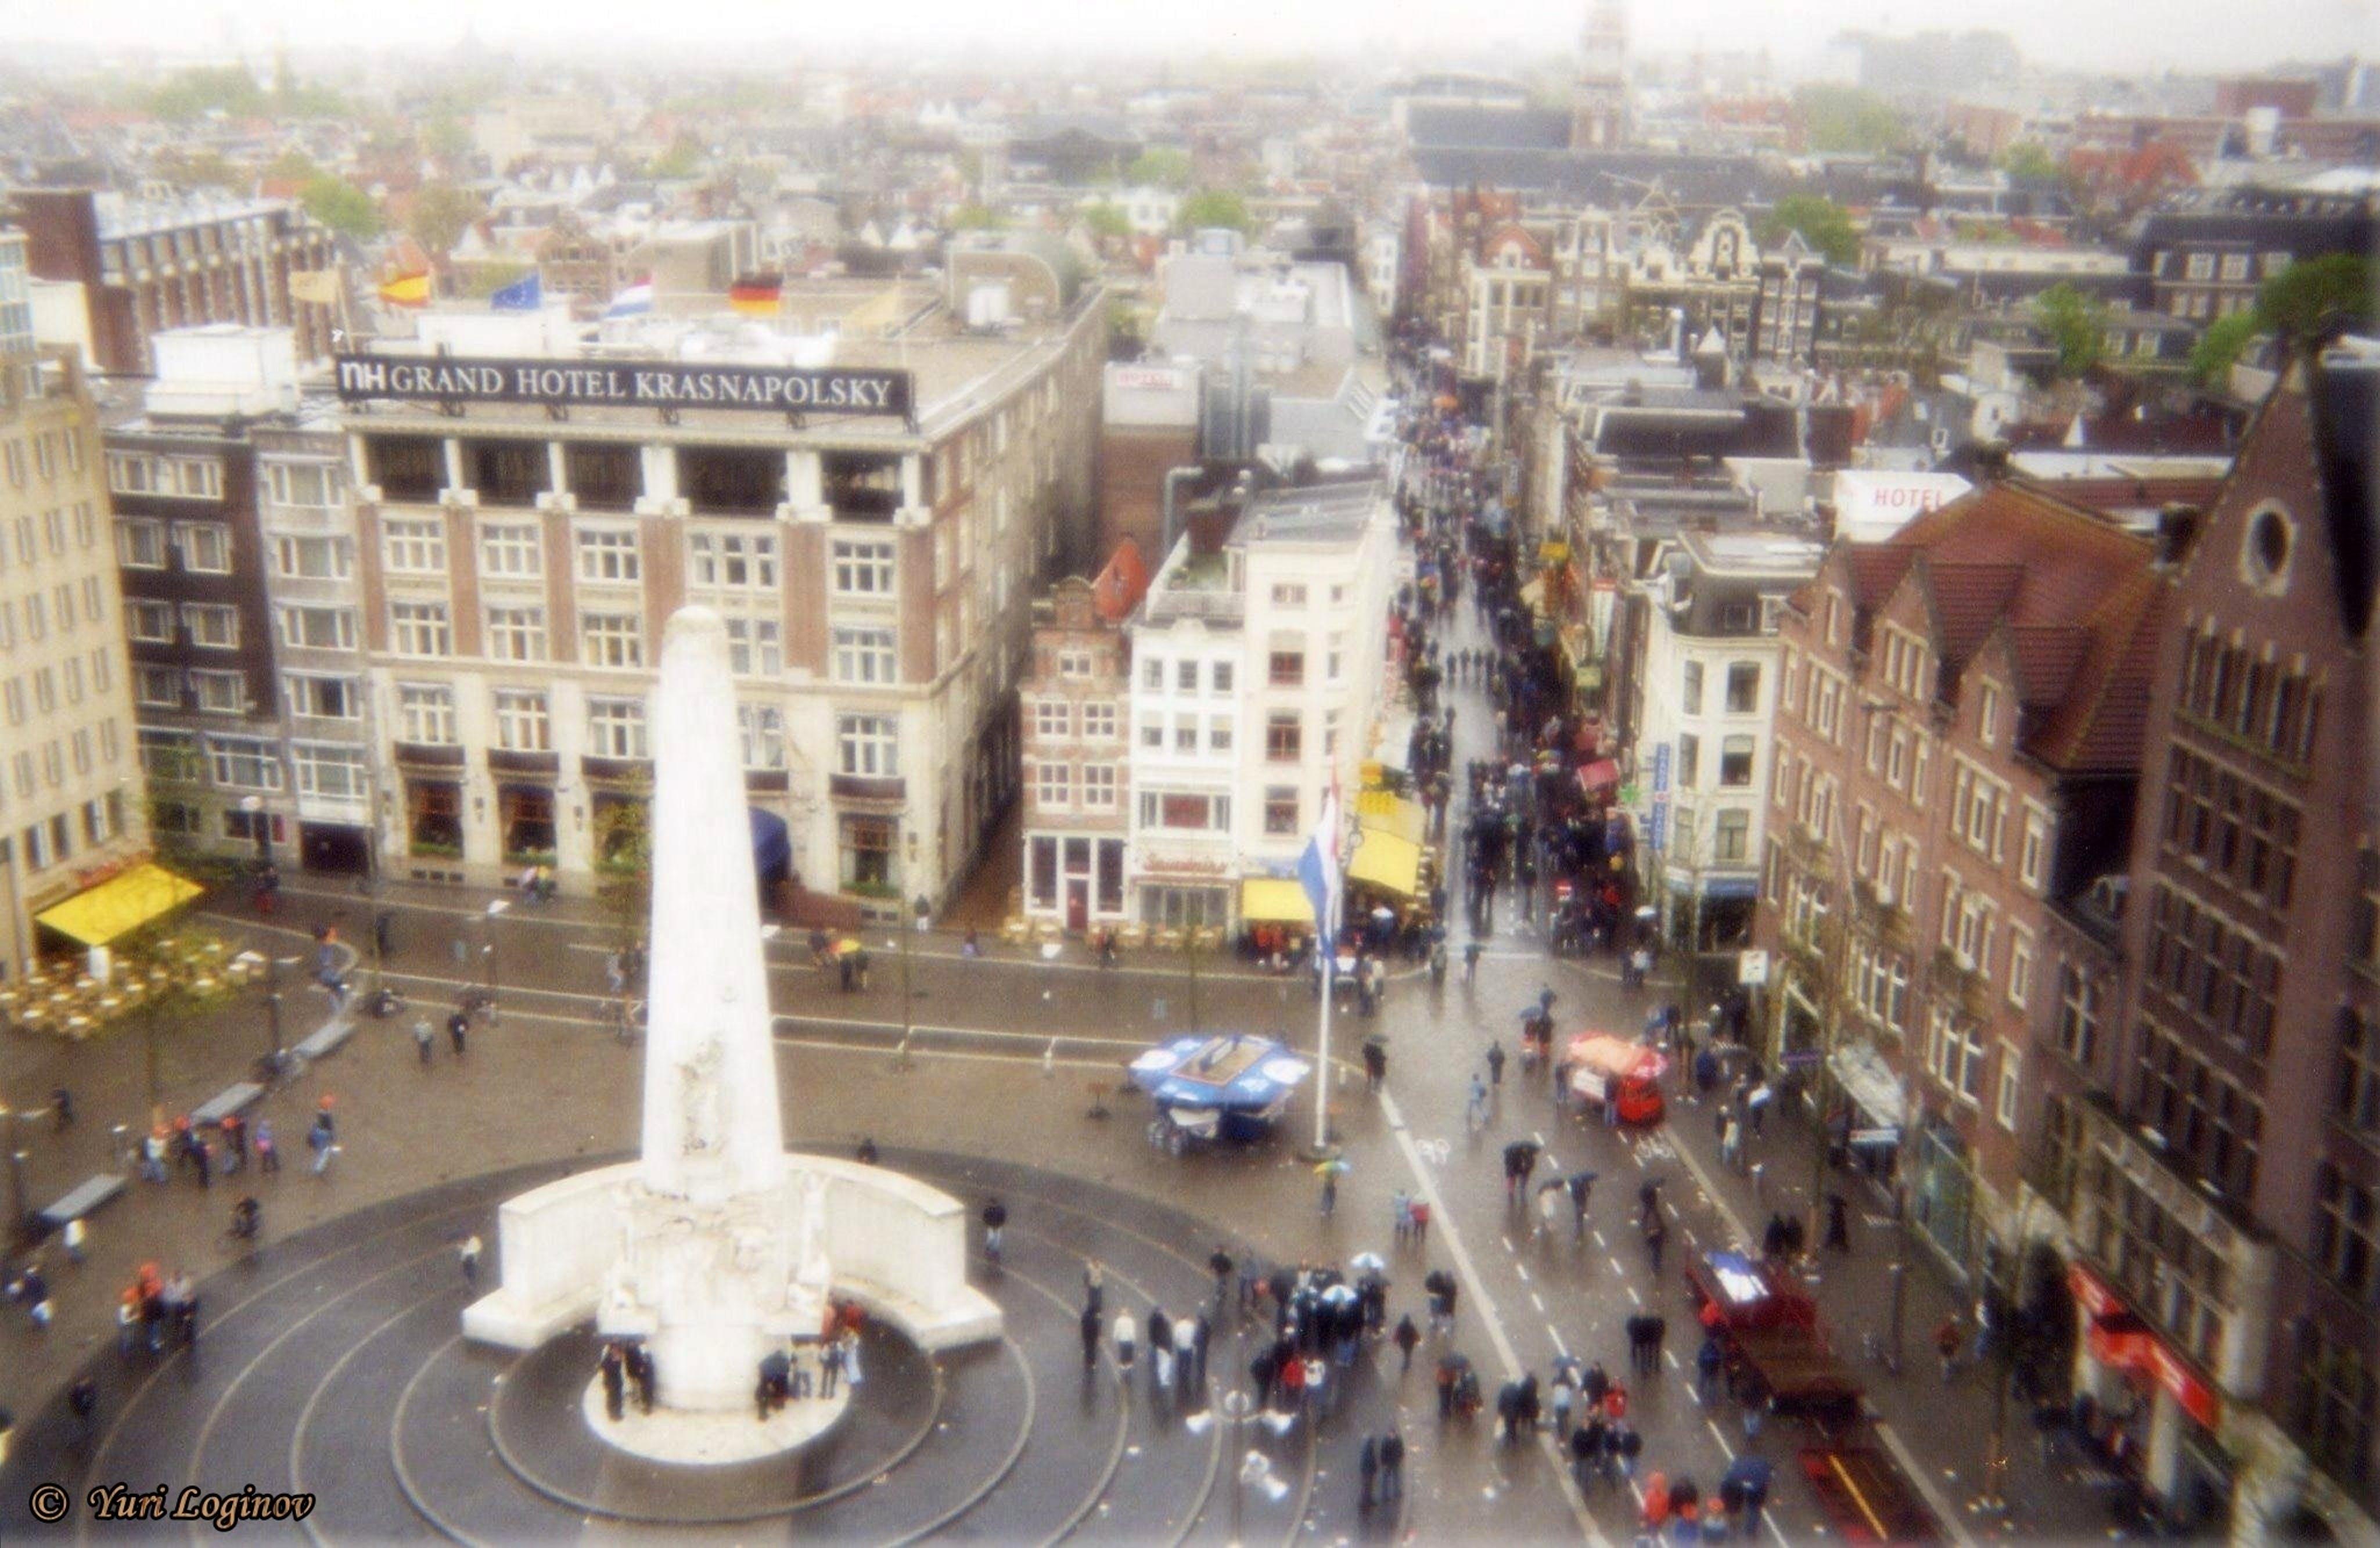 Free stock photo of amsterdam, netherlands, Nederland, dam square